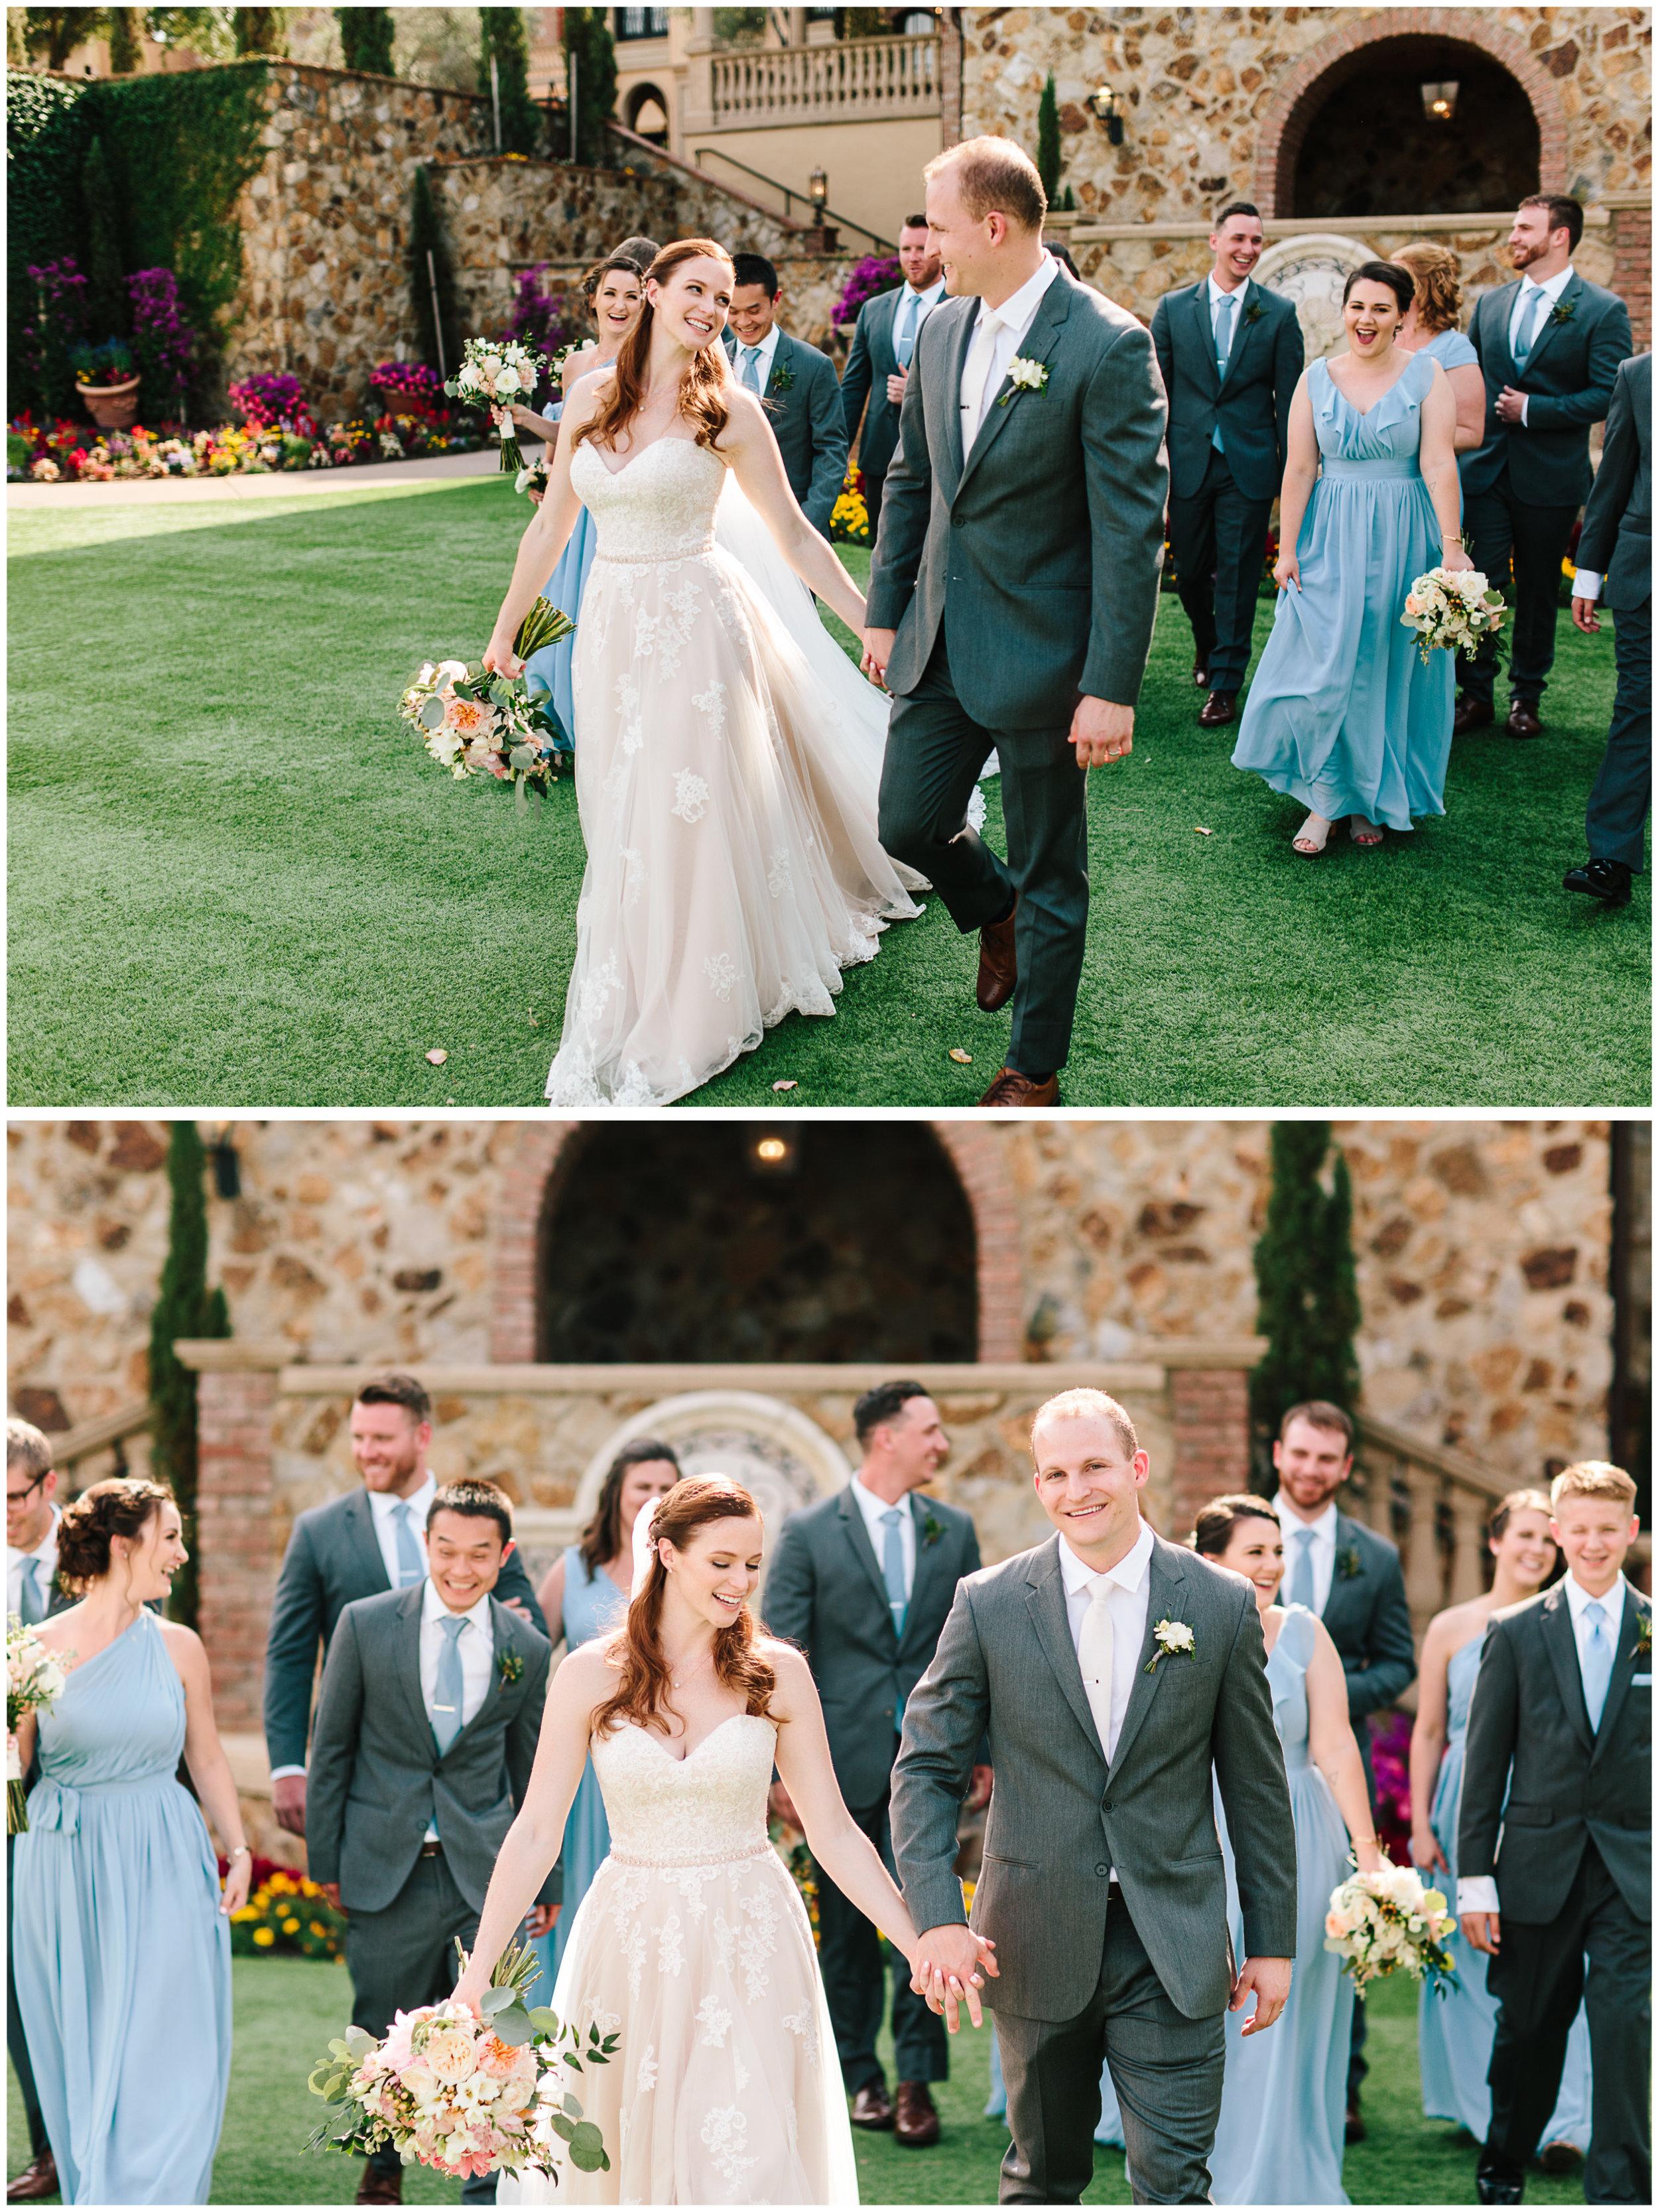 bella_collina_wedding_56a.jpg